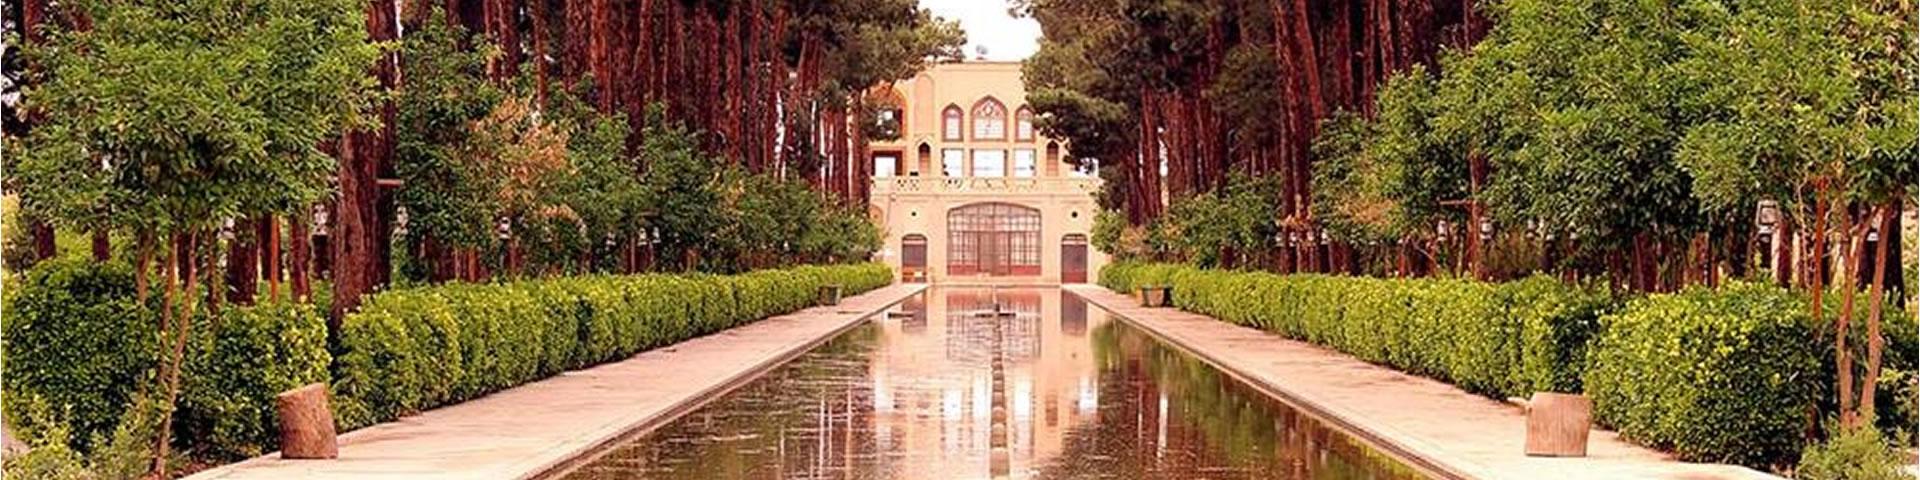 هشت باغ دولت